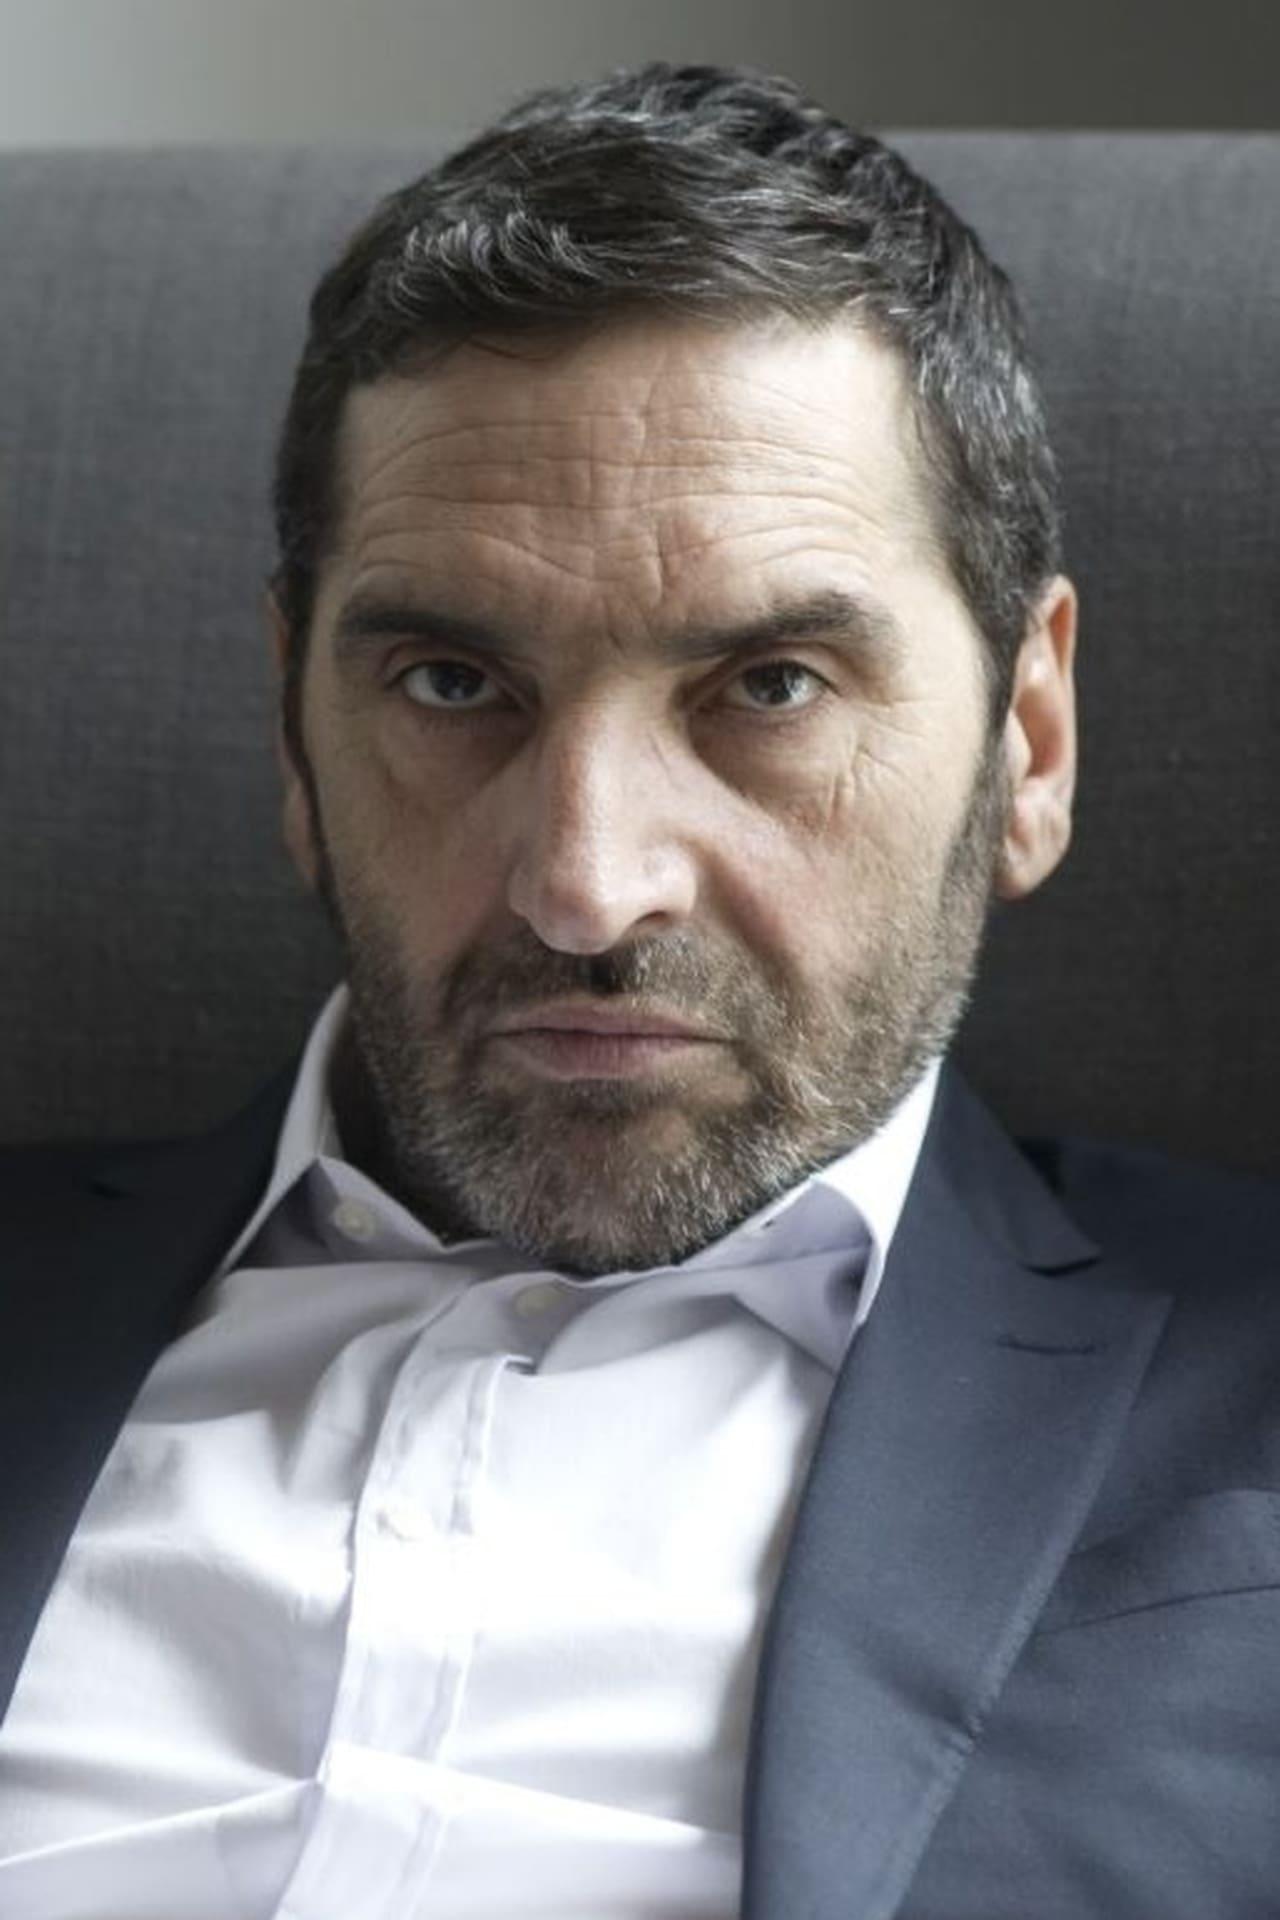 Adamo Dionisi isFranco